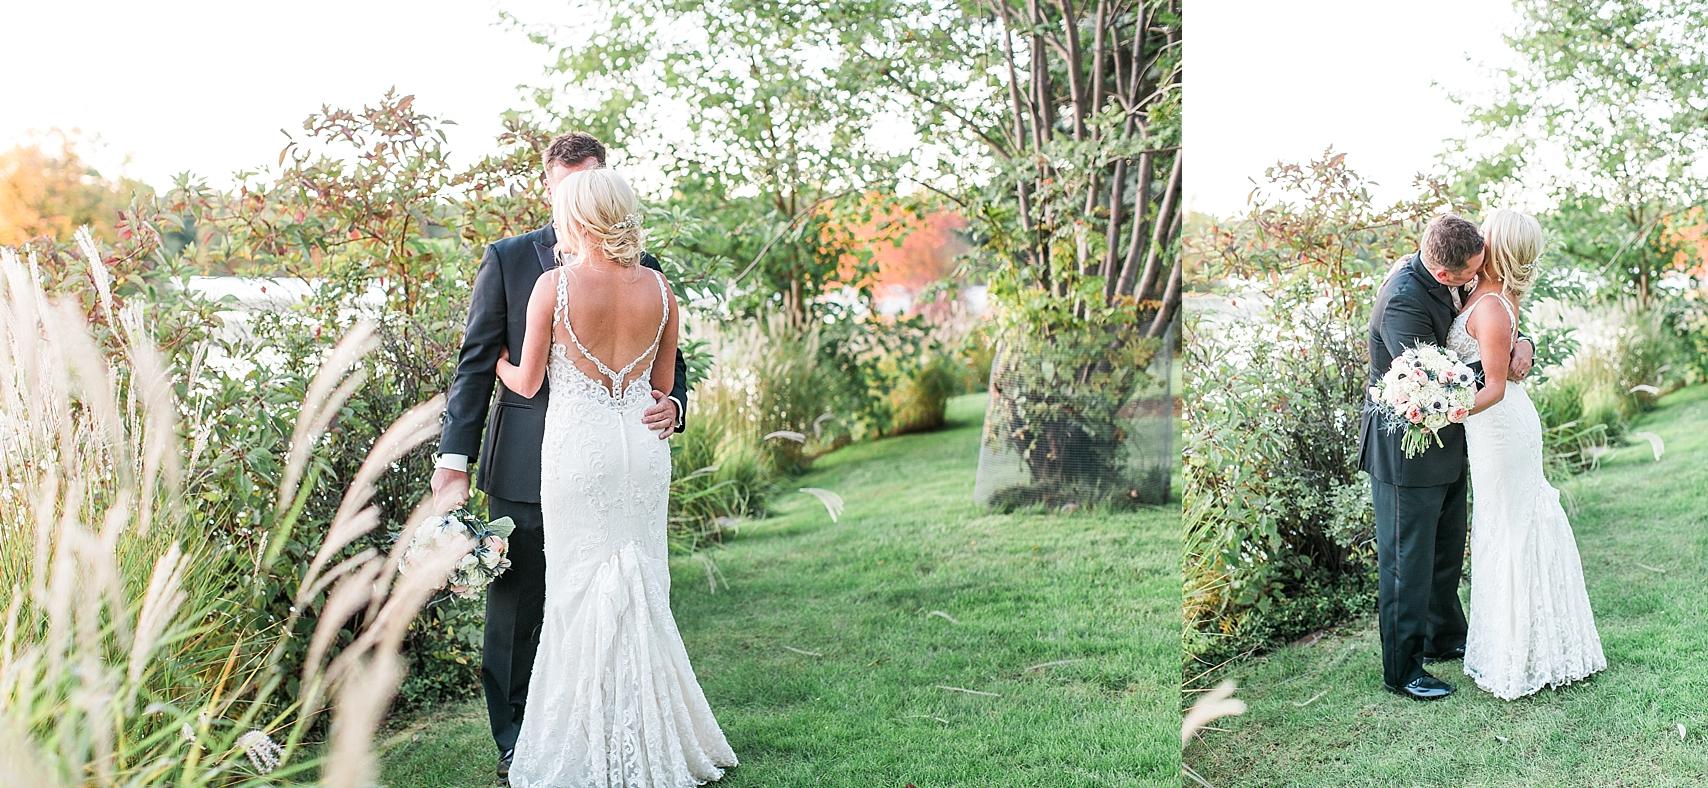 Minnesota Minneapolis Wedding Photographer Best Of 2018 Weddings Mallory Kiesow Photography_0157.jpg